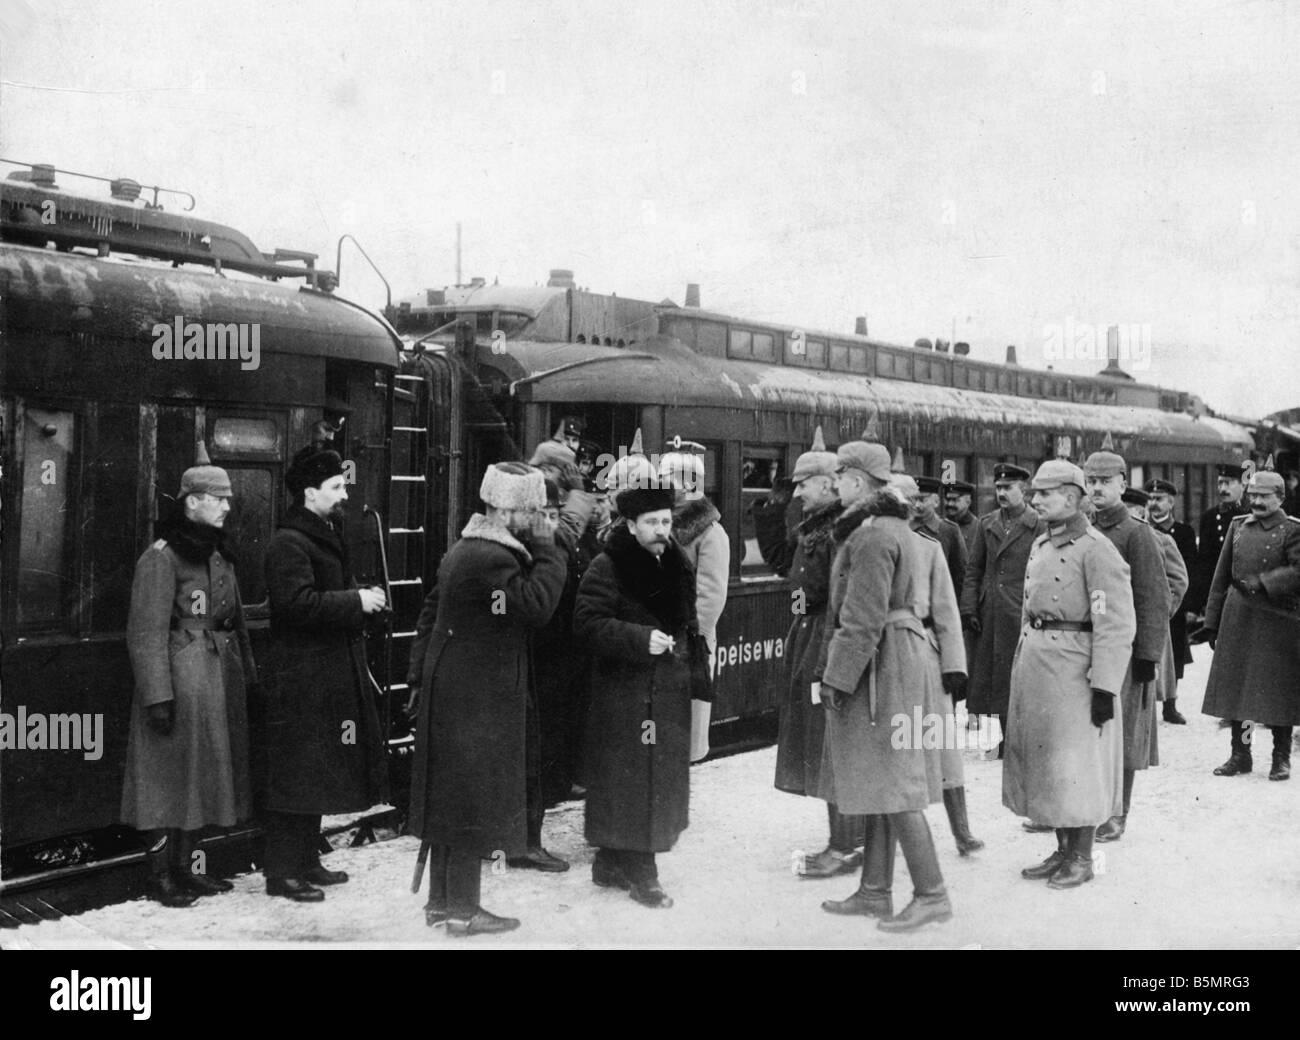 9 1917 12 15 A1 19 Brest Litowsk Arrival Russ delegacy World War 1 1914 18 Russian German armistice of Brest Litowsk - Stock Image